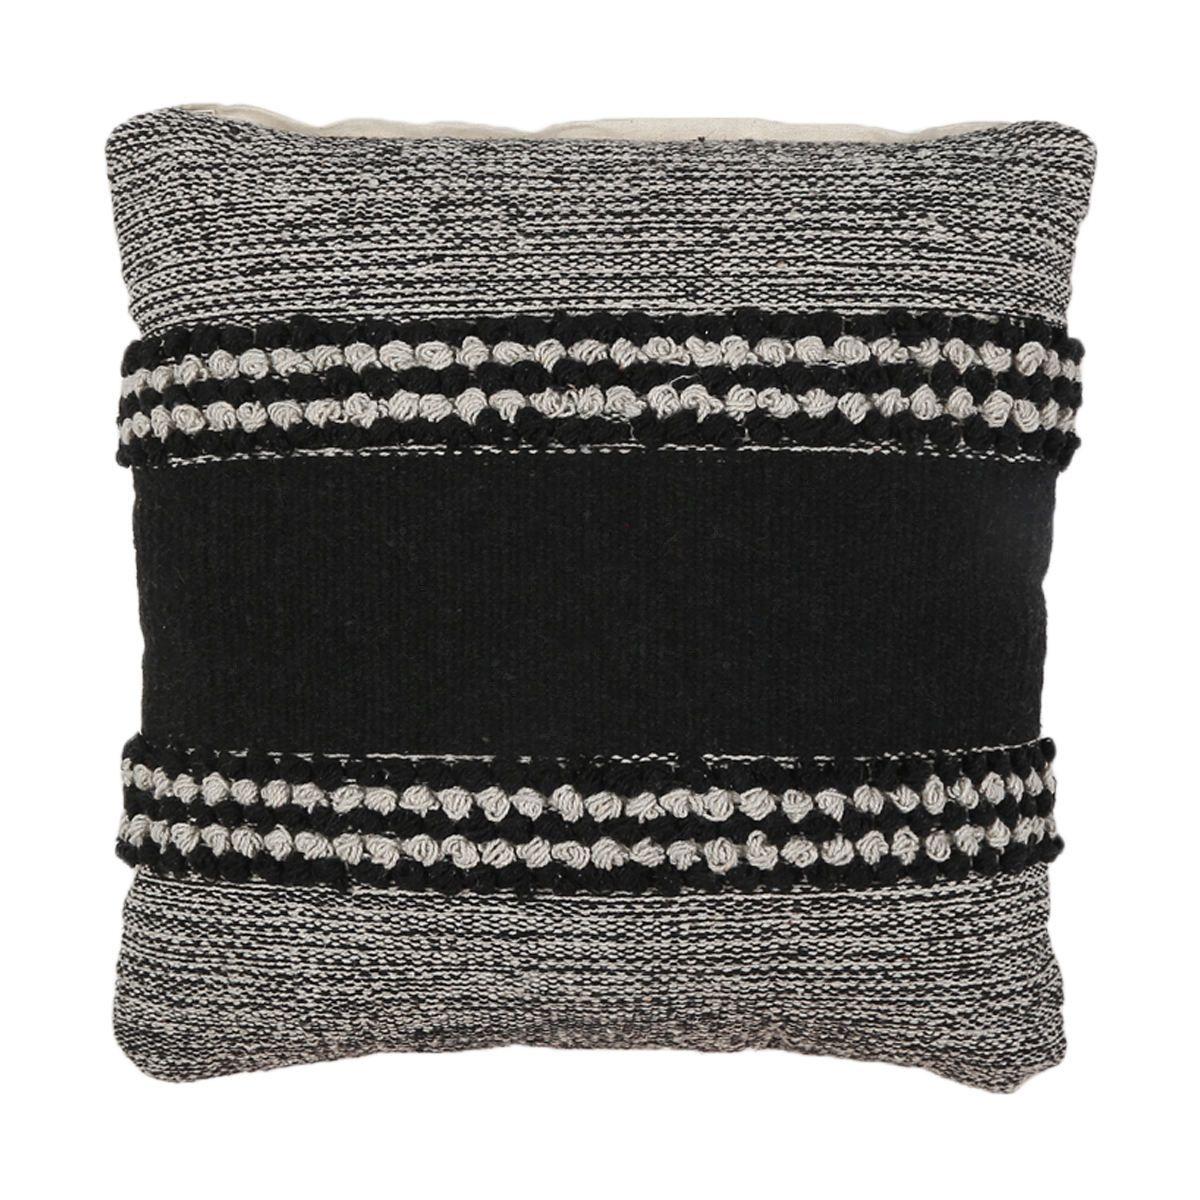 Nala Cushion Kmart Bed Linen Australia Cushions Bed